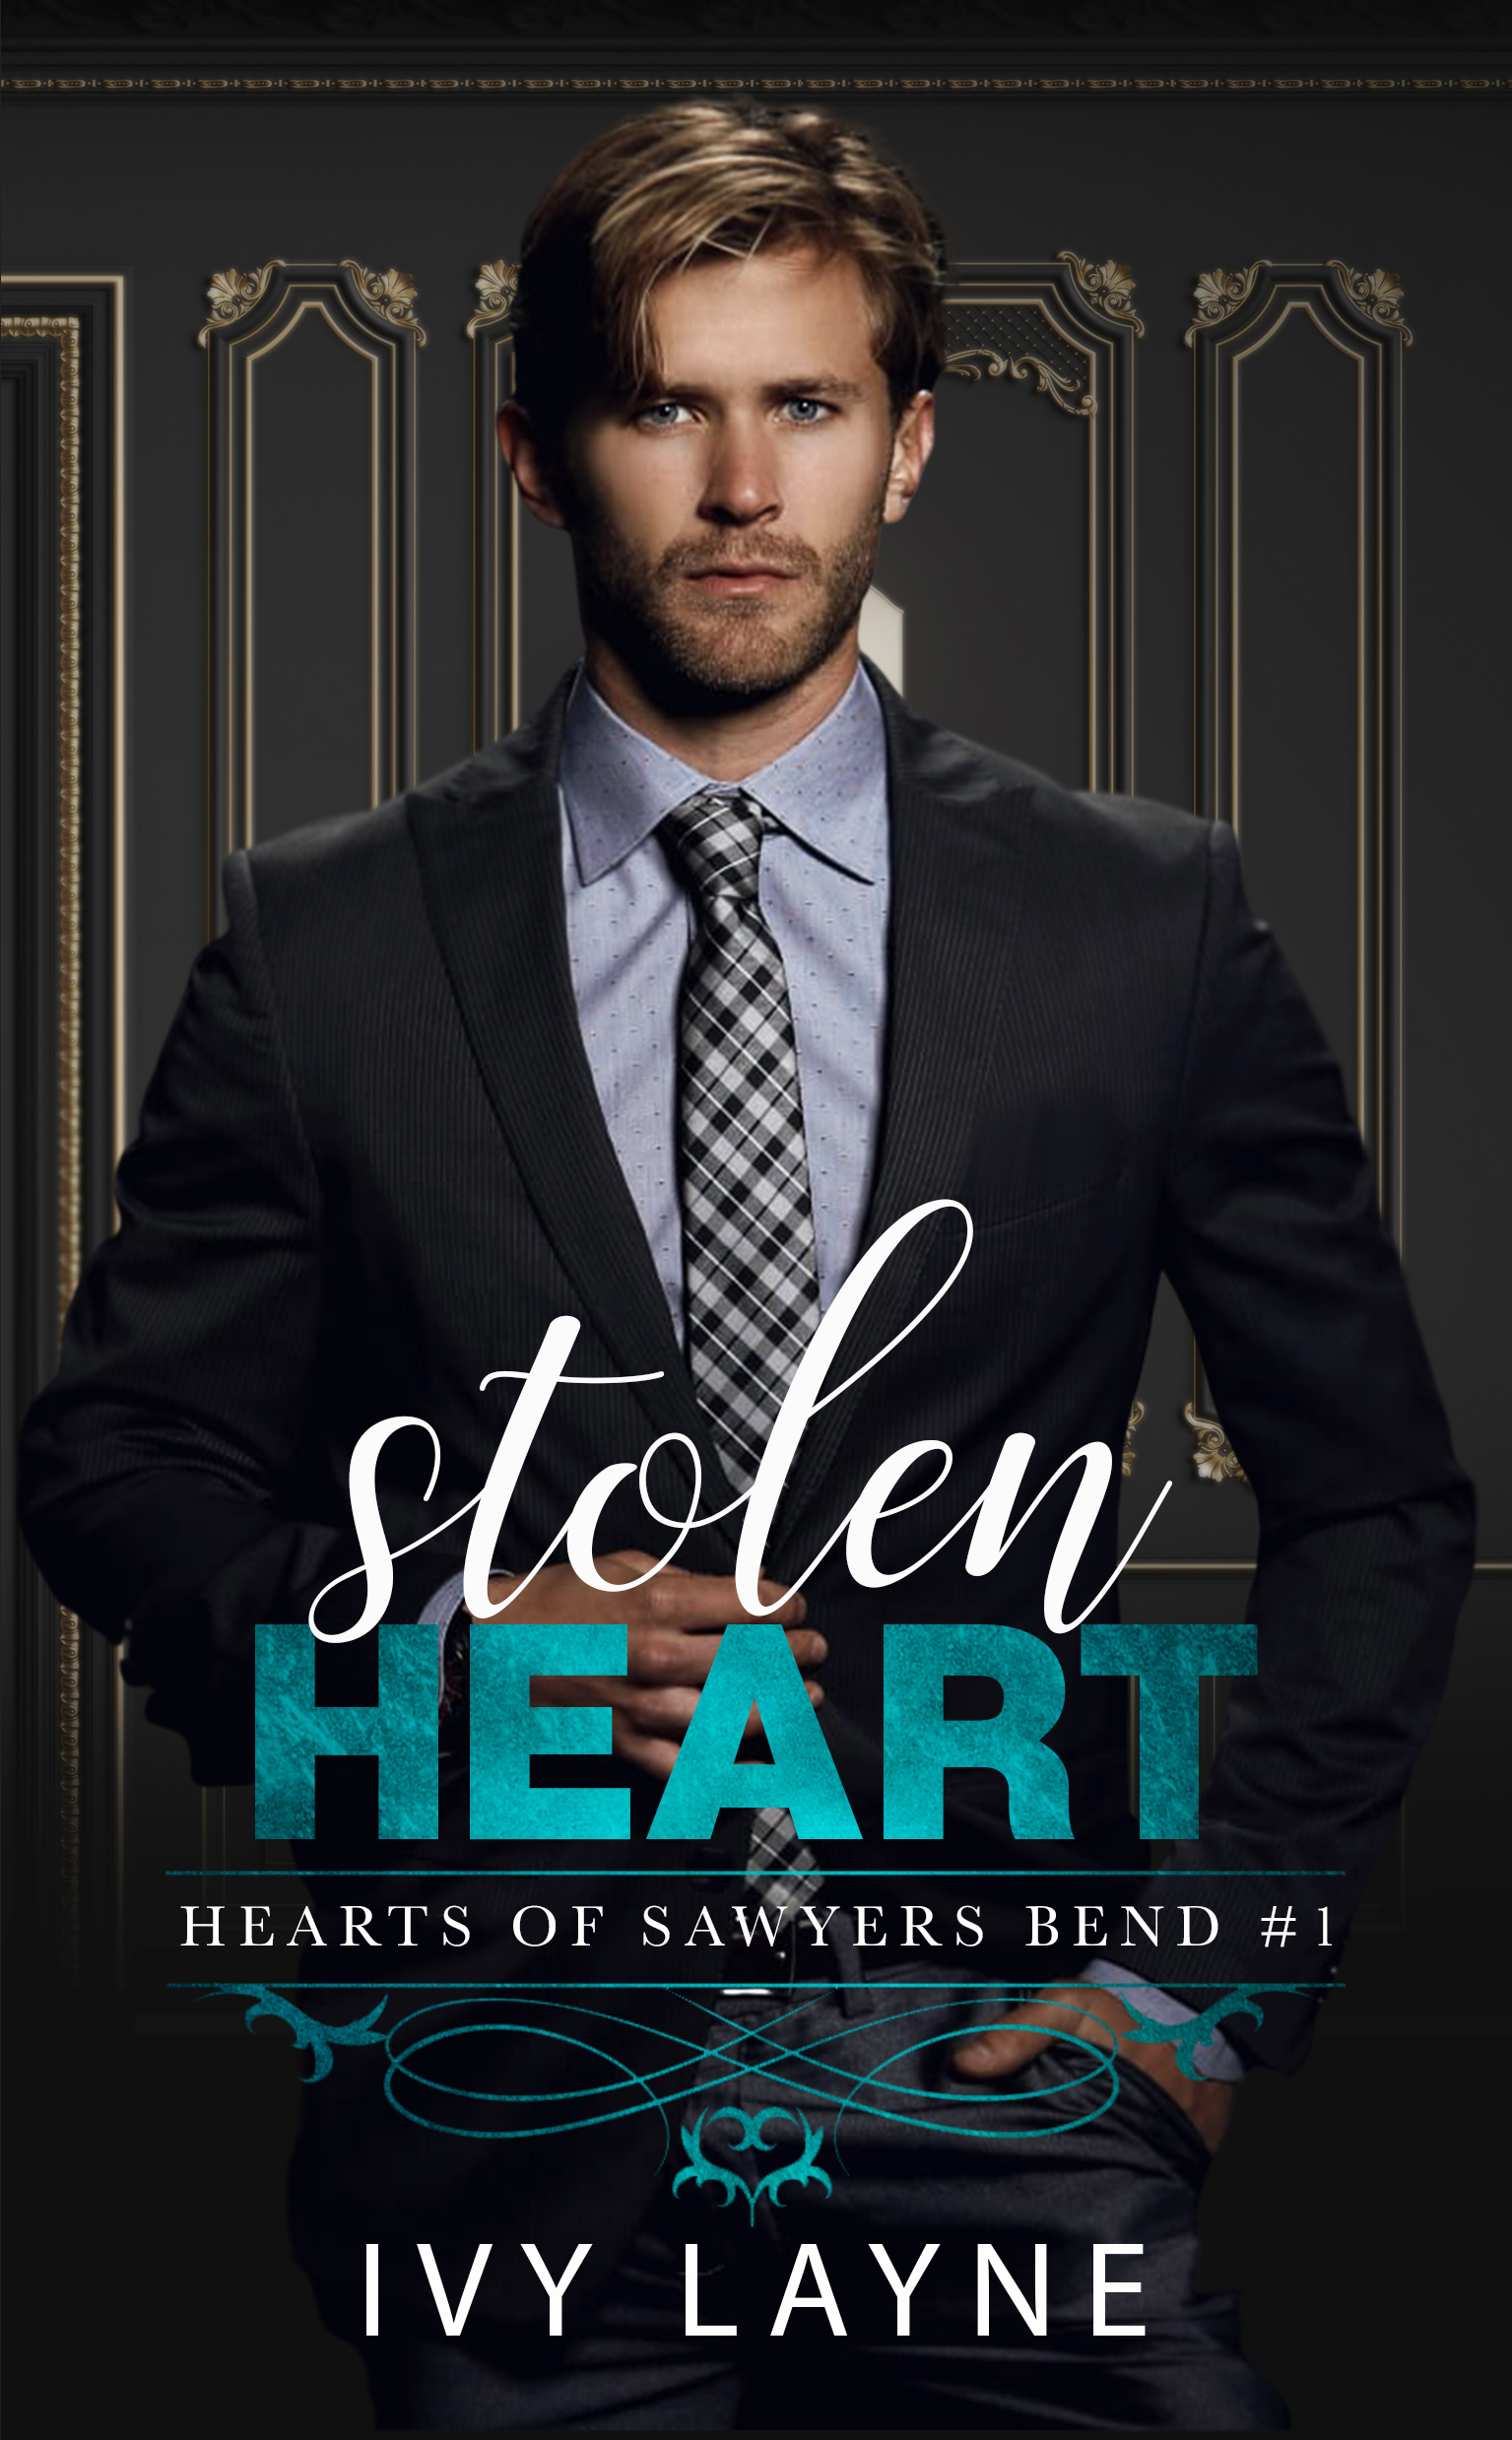 Stolen Heart- Ivy Layne